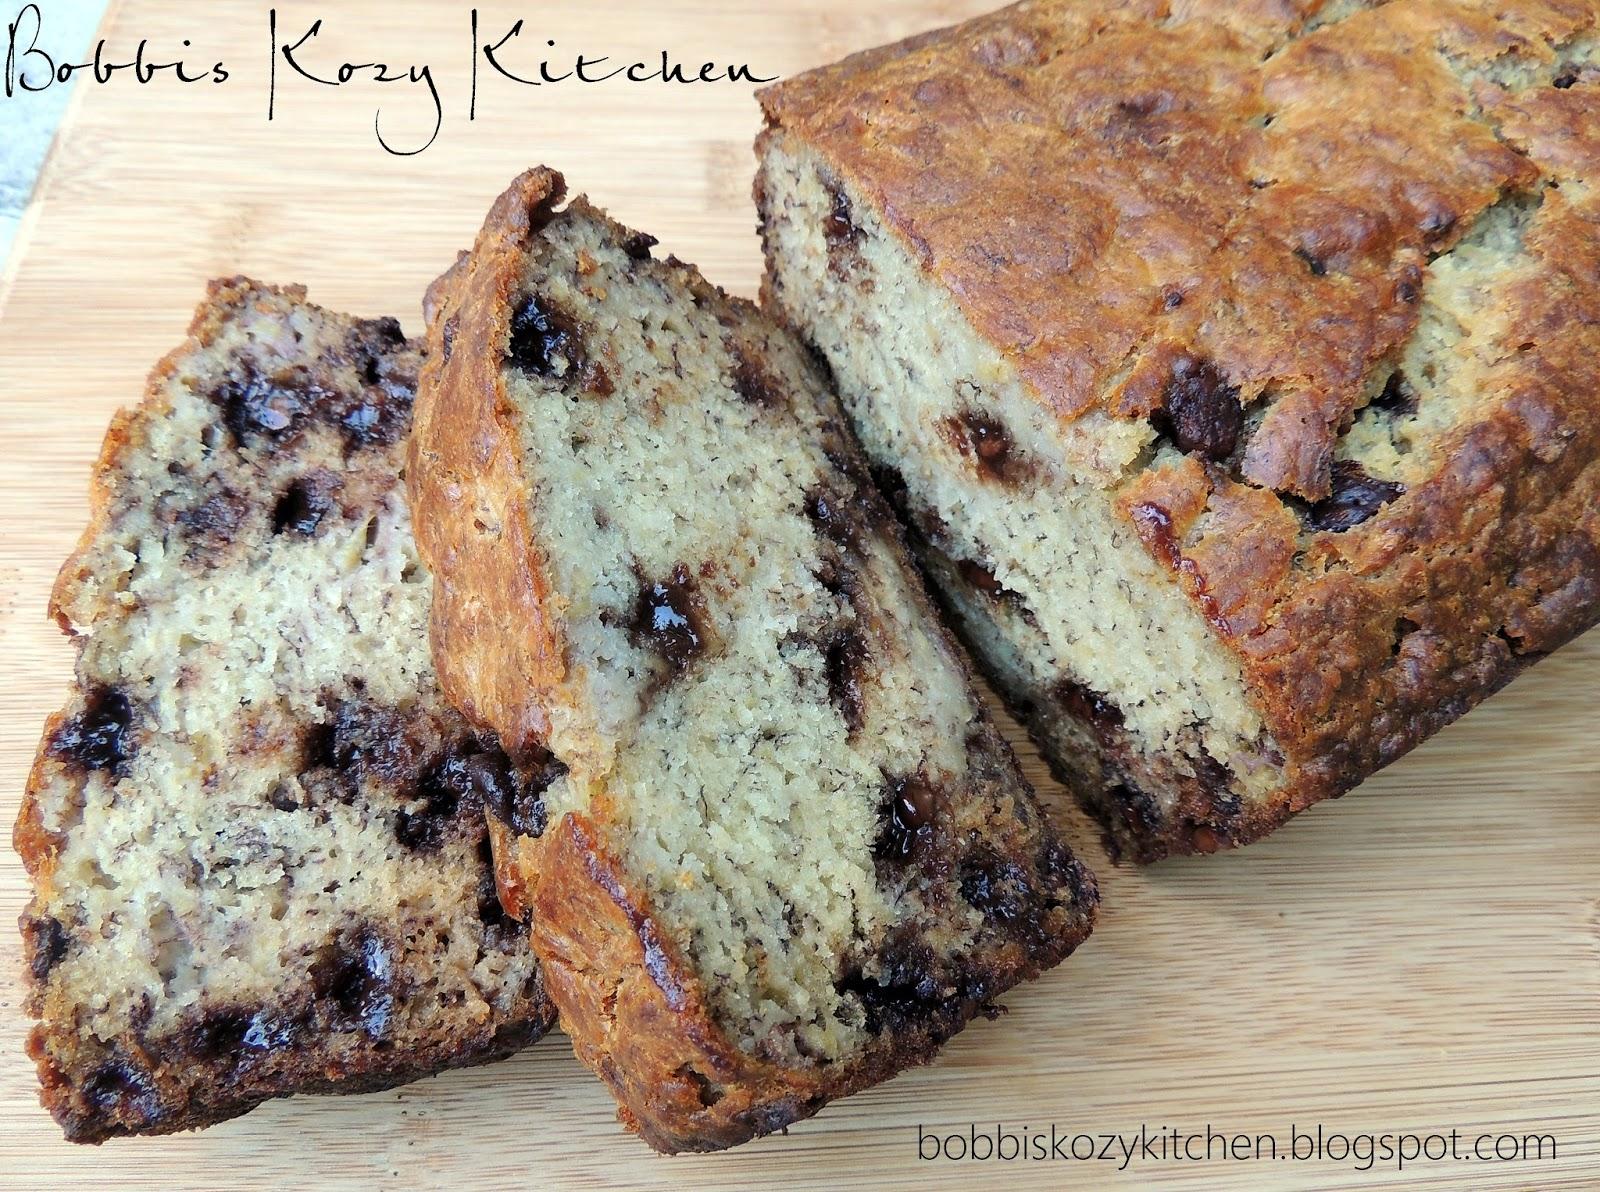 Chocolate Chip Banana Bread | Bobbi's Kozy Kitchen